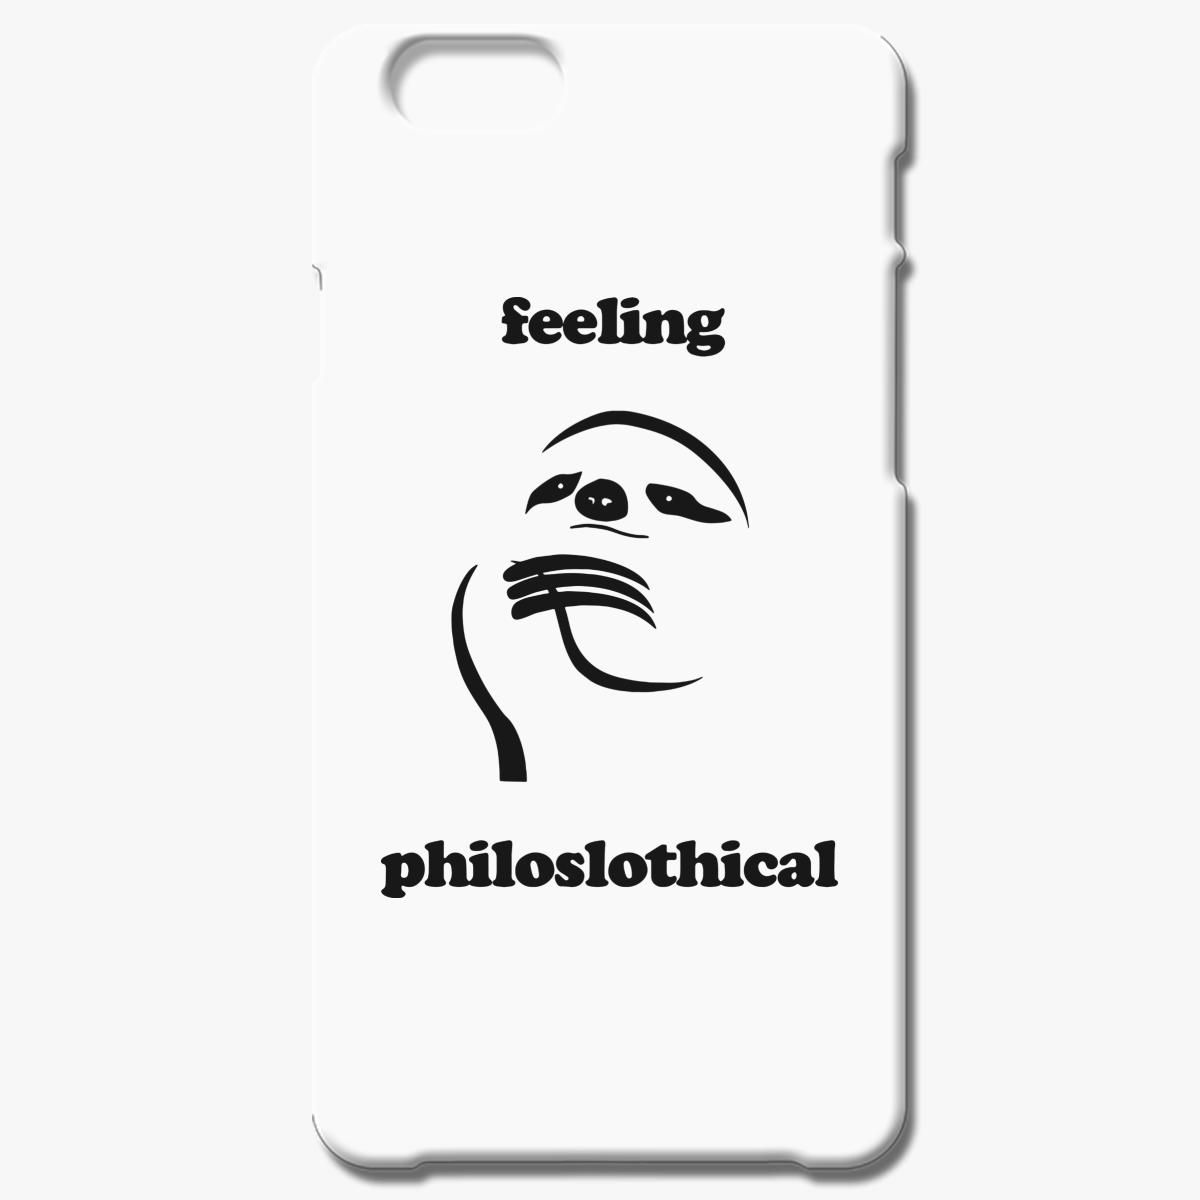 Feeling Philoslothical Iphone 6 6s Plus Case